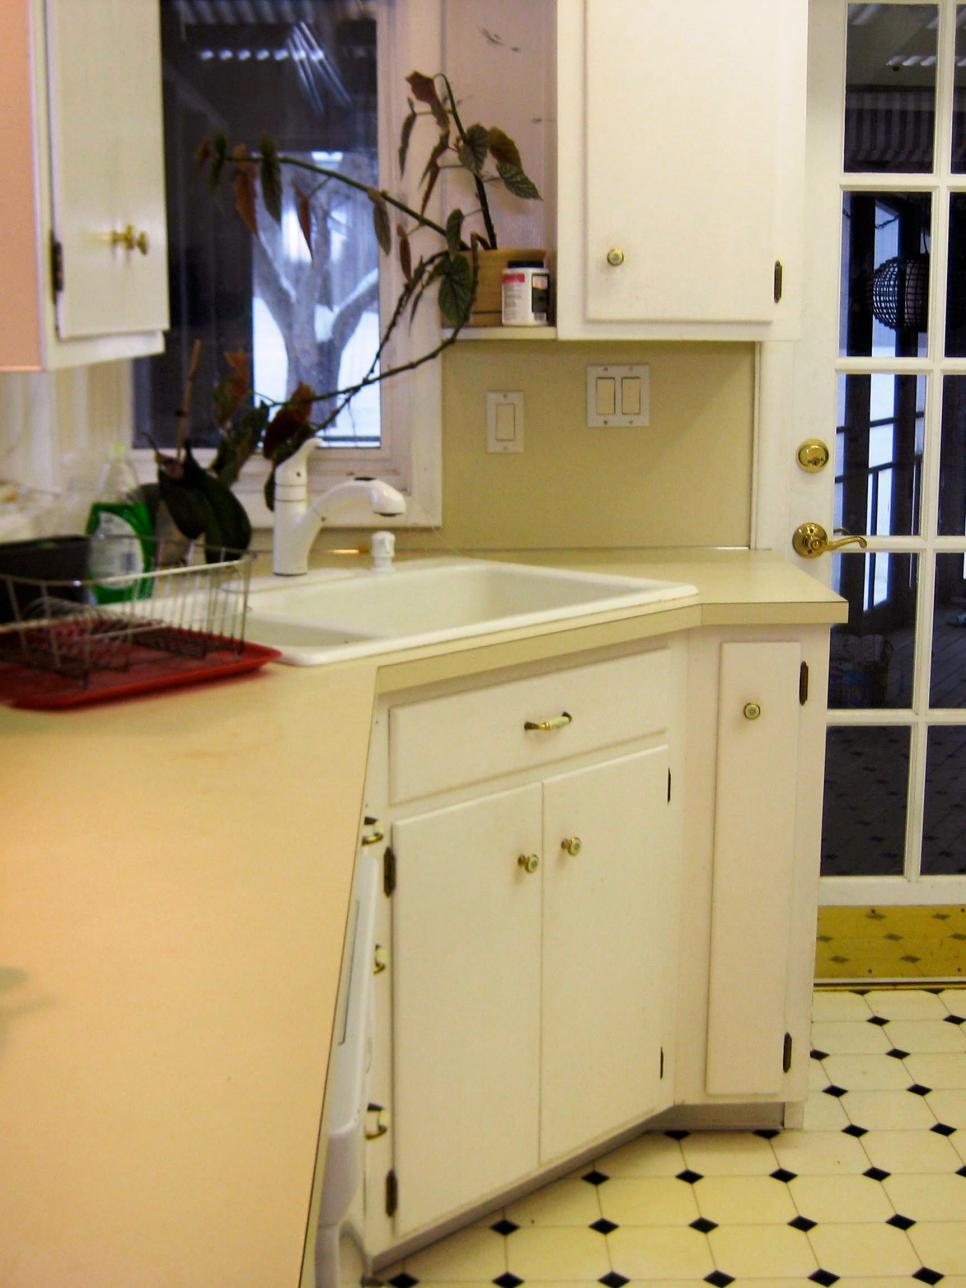 BudgetFriendly BeforeandAfter Kitchen Makeovers DIY -  diy affordable kitchen